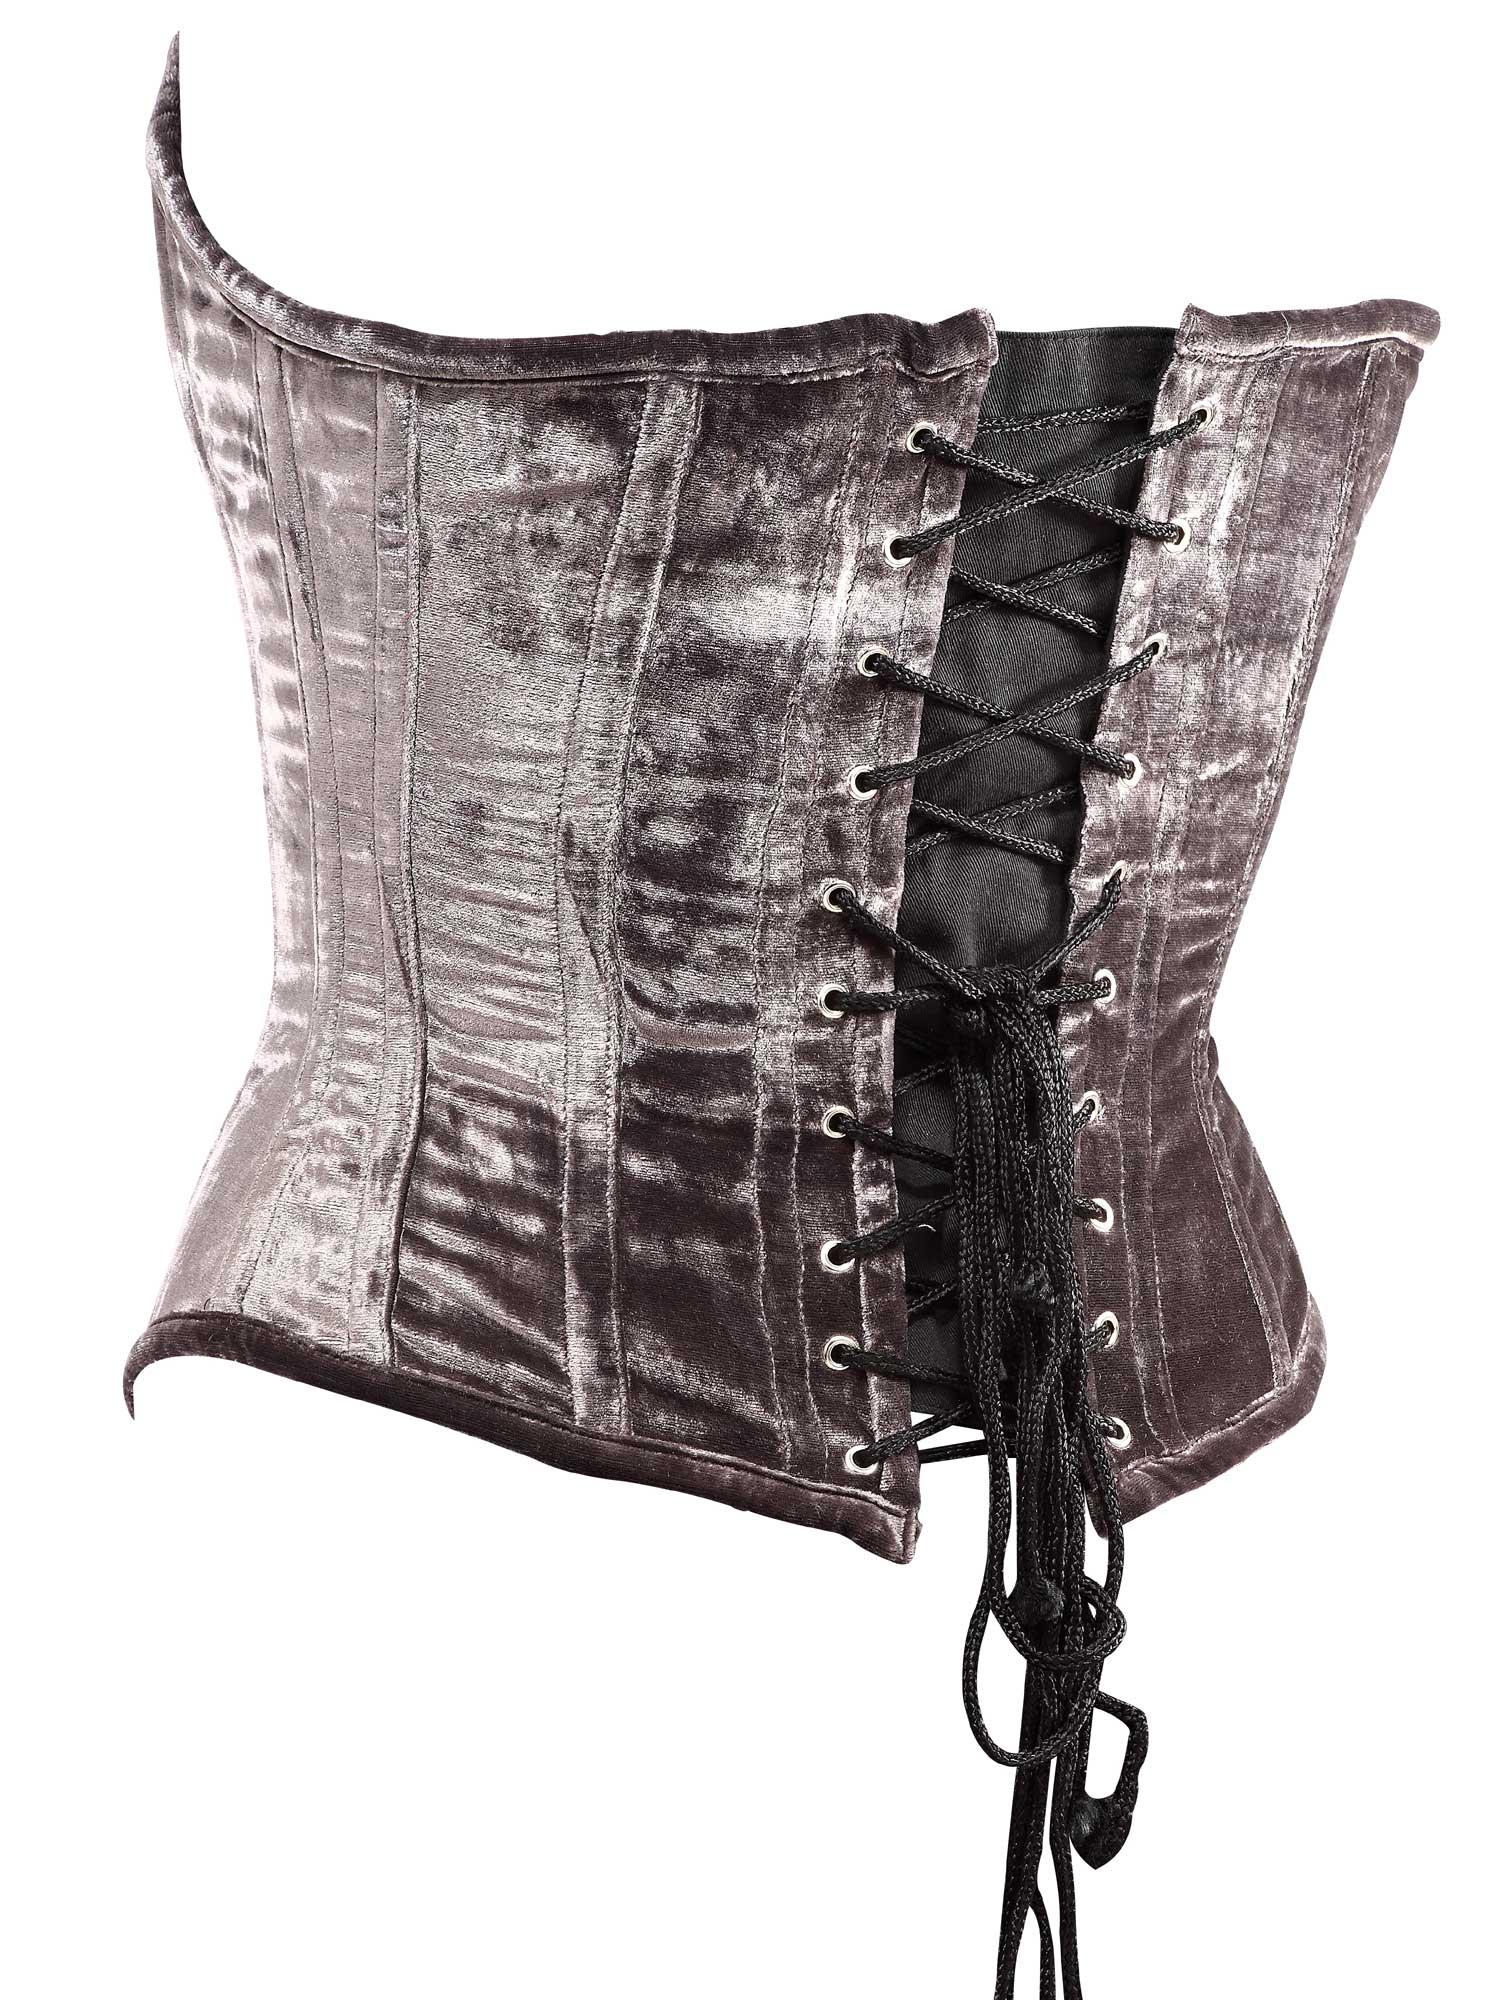 sand_color_velvet_fabric_steel_boning_corset_waist_cincher_bustier_bustiers_and_corsets_3.jpg